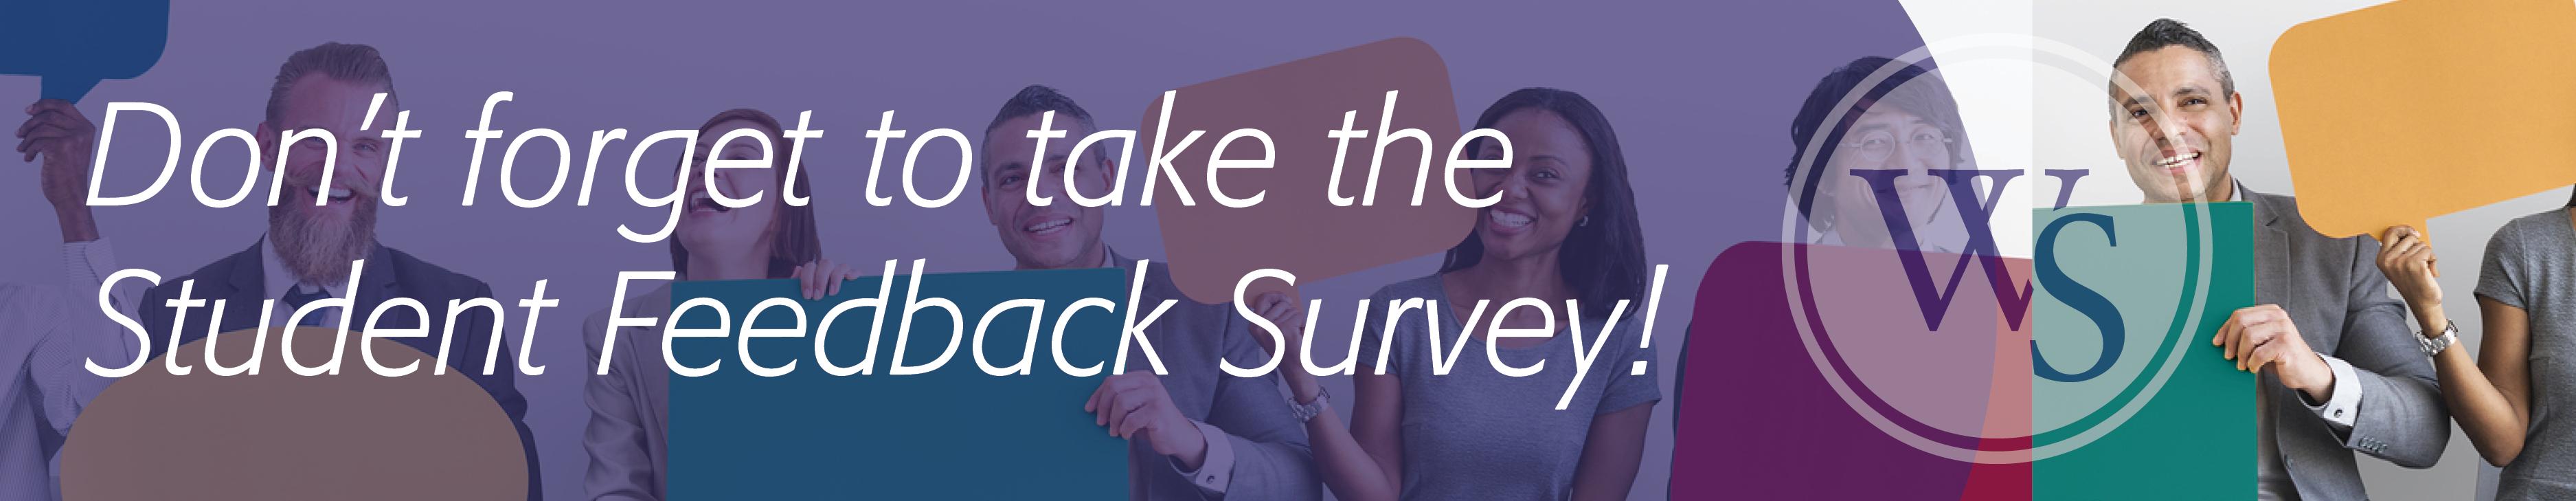 Student Feedback Survey Header Image